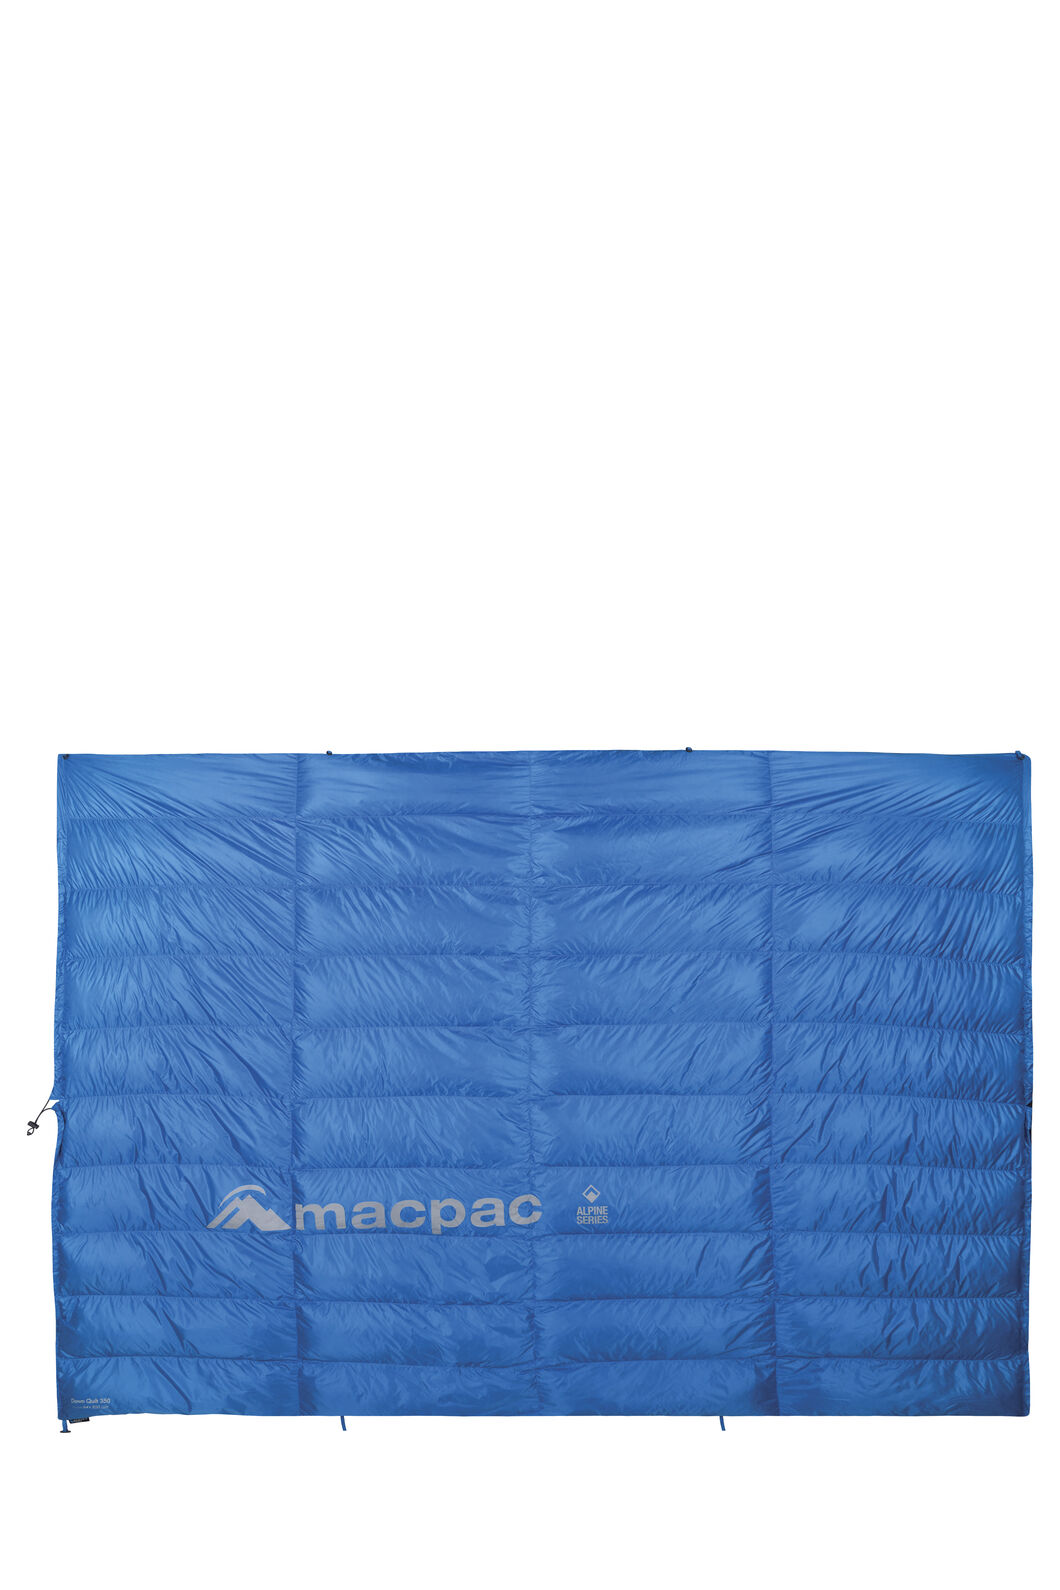 Macpac NZAT HyperDRY™ Down Quilt 350, Cerulean Blue, hi-res